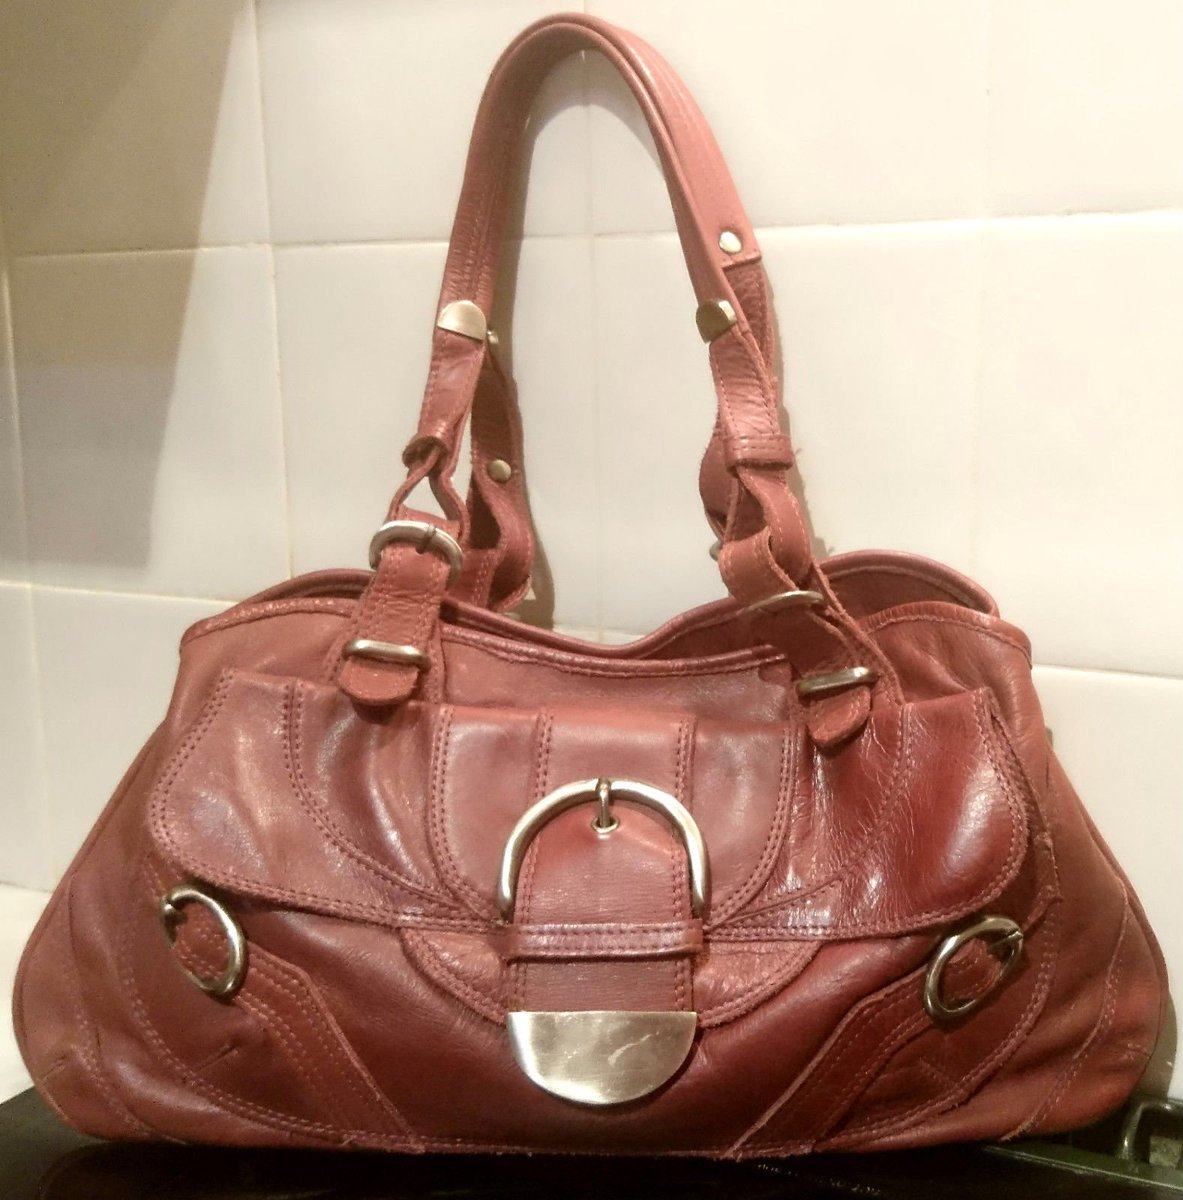 Trim Designer Handbag Ping Fashion Ebay Usa Australia Style X Co Uk Itm 252651311003